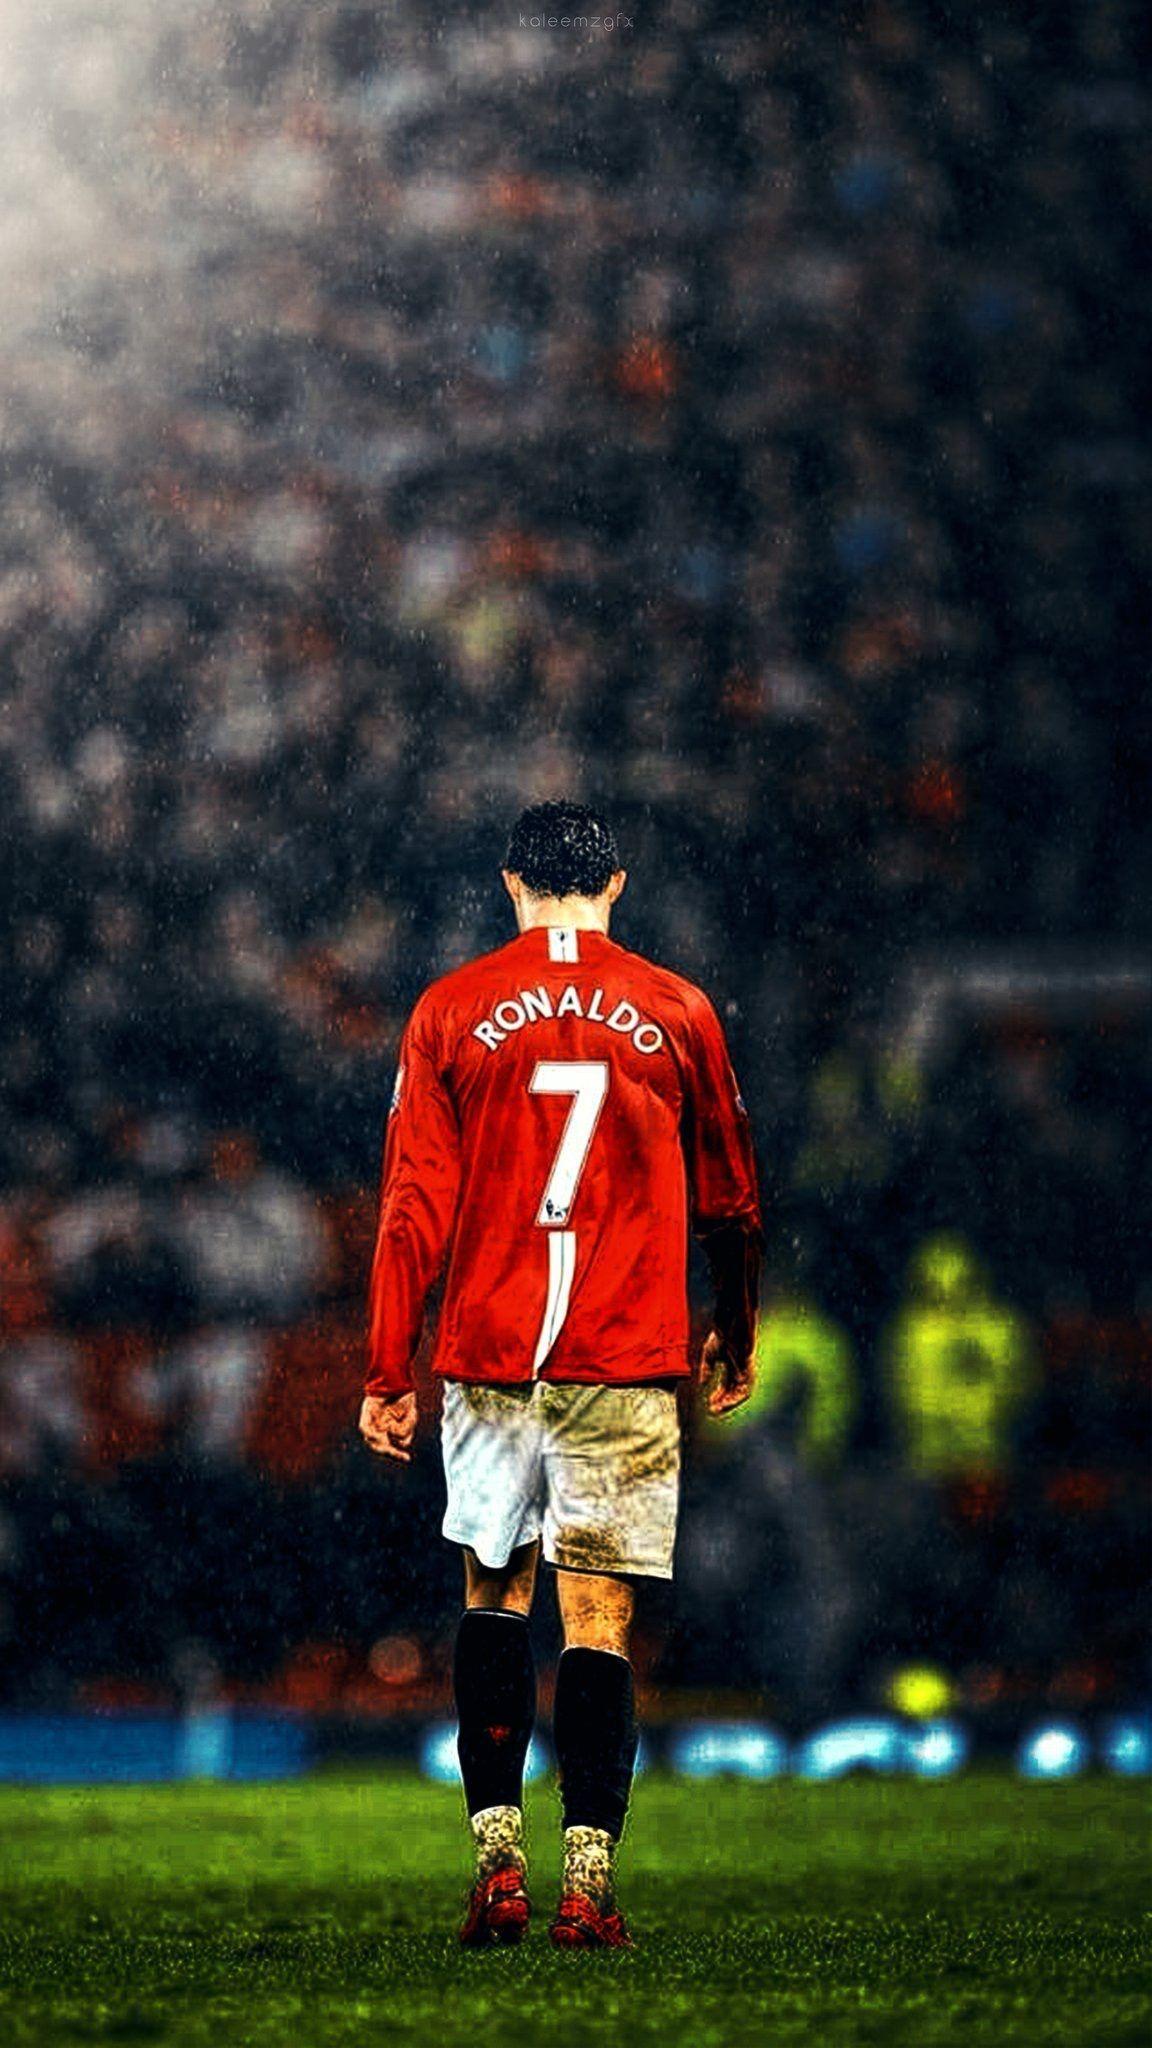 Cristiano Ronaldo Manchester United Wallpapers Top Free Cristiano Ronaldo Manchester United Backgrounds Wallpaperaccess